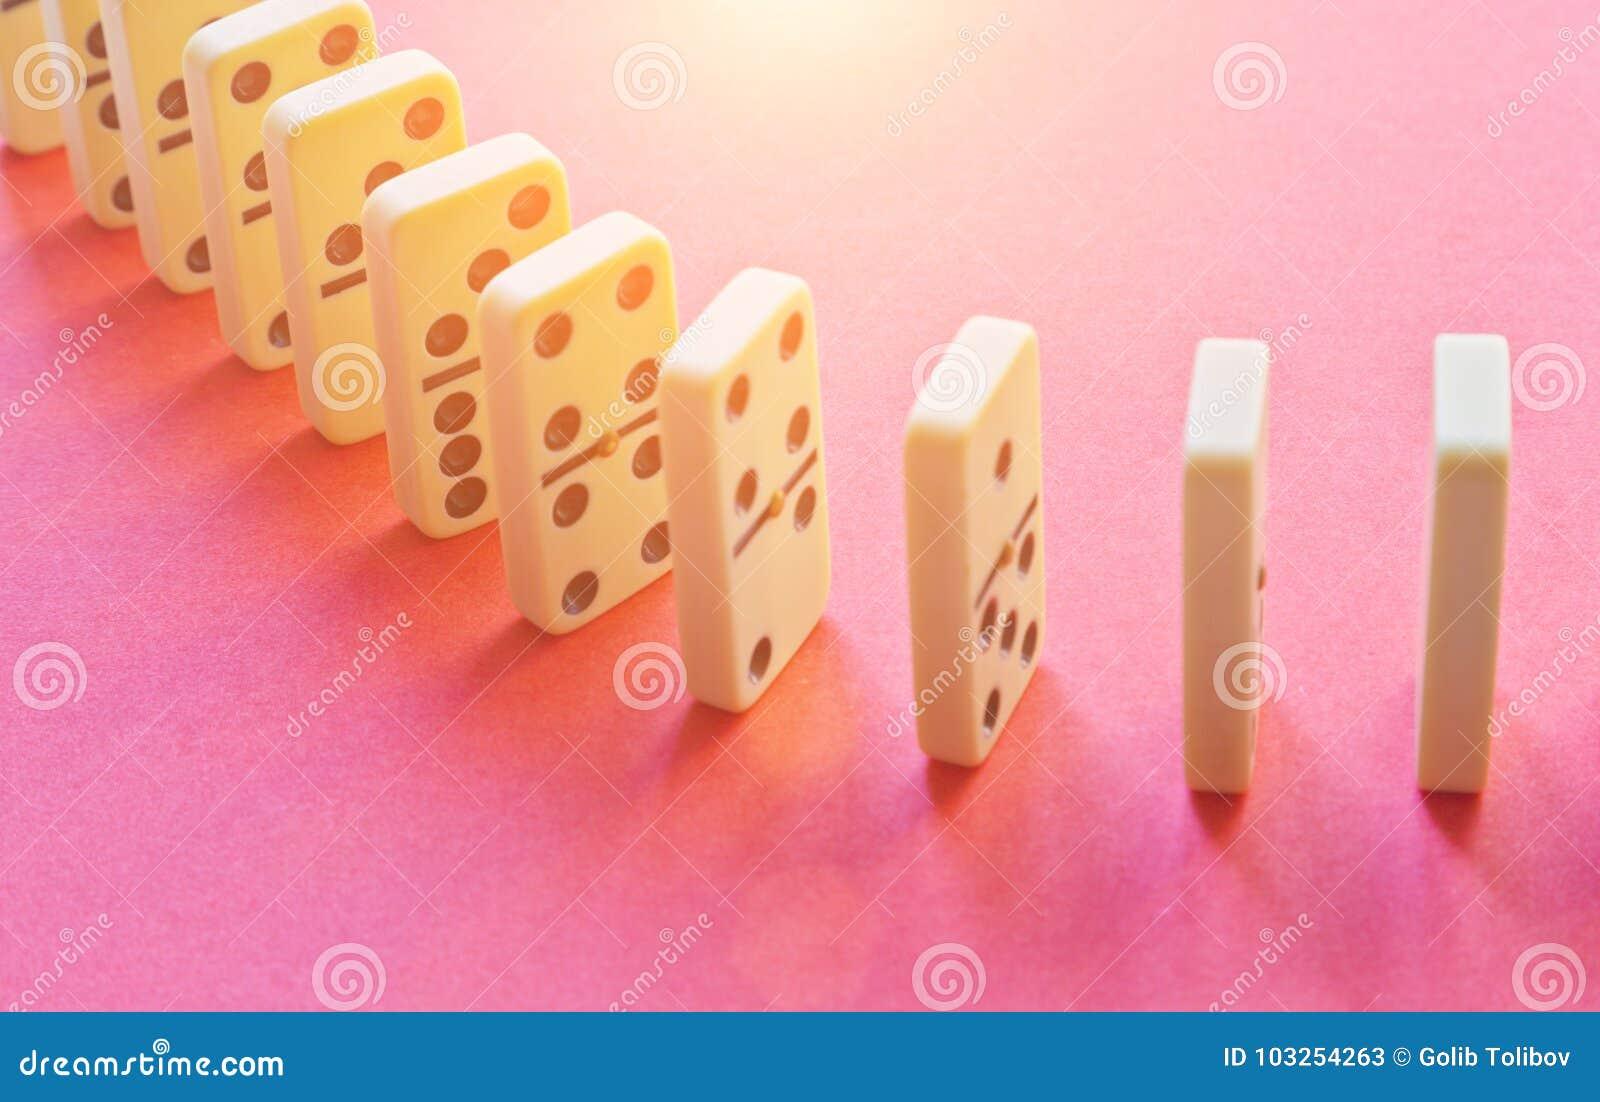 Domino rząd na menchiach